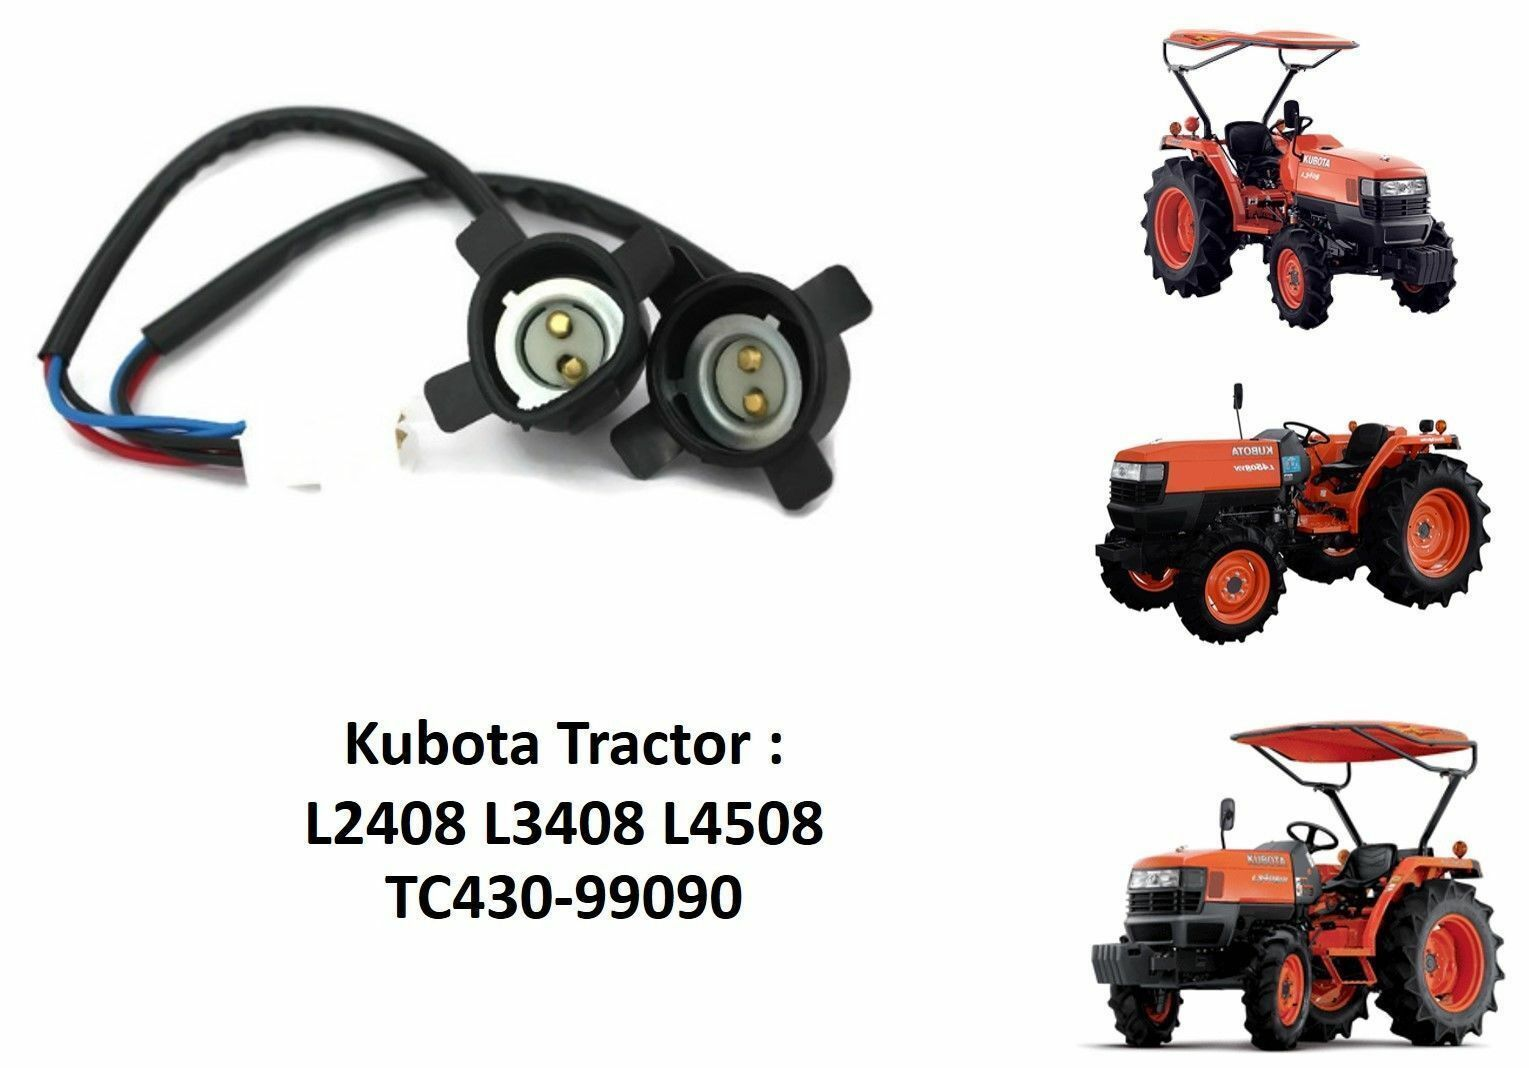 Kubota Assy Wire Harness Headlight Socket L3710dt Gst Hst Set Front Automotive Wiring Gallery